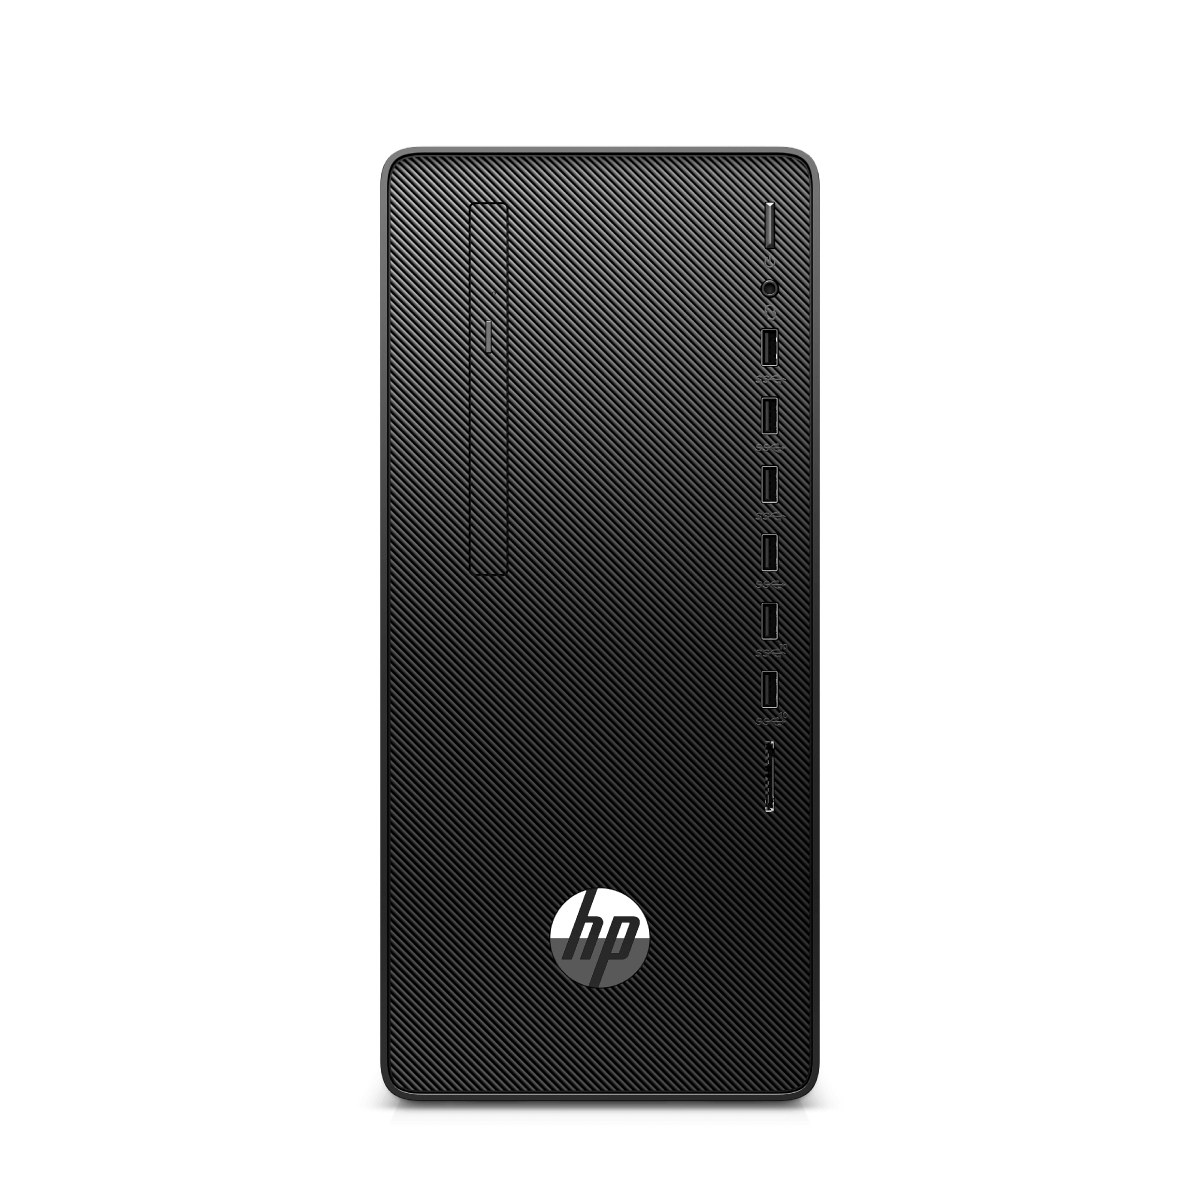 HP 280 Pro G6 Microtower (i3, Black)